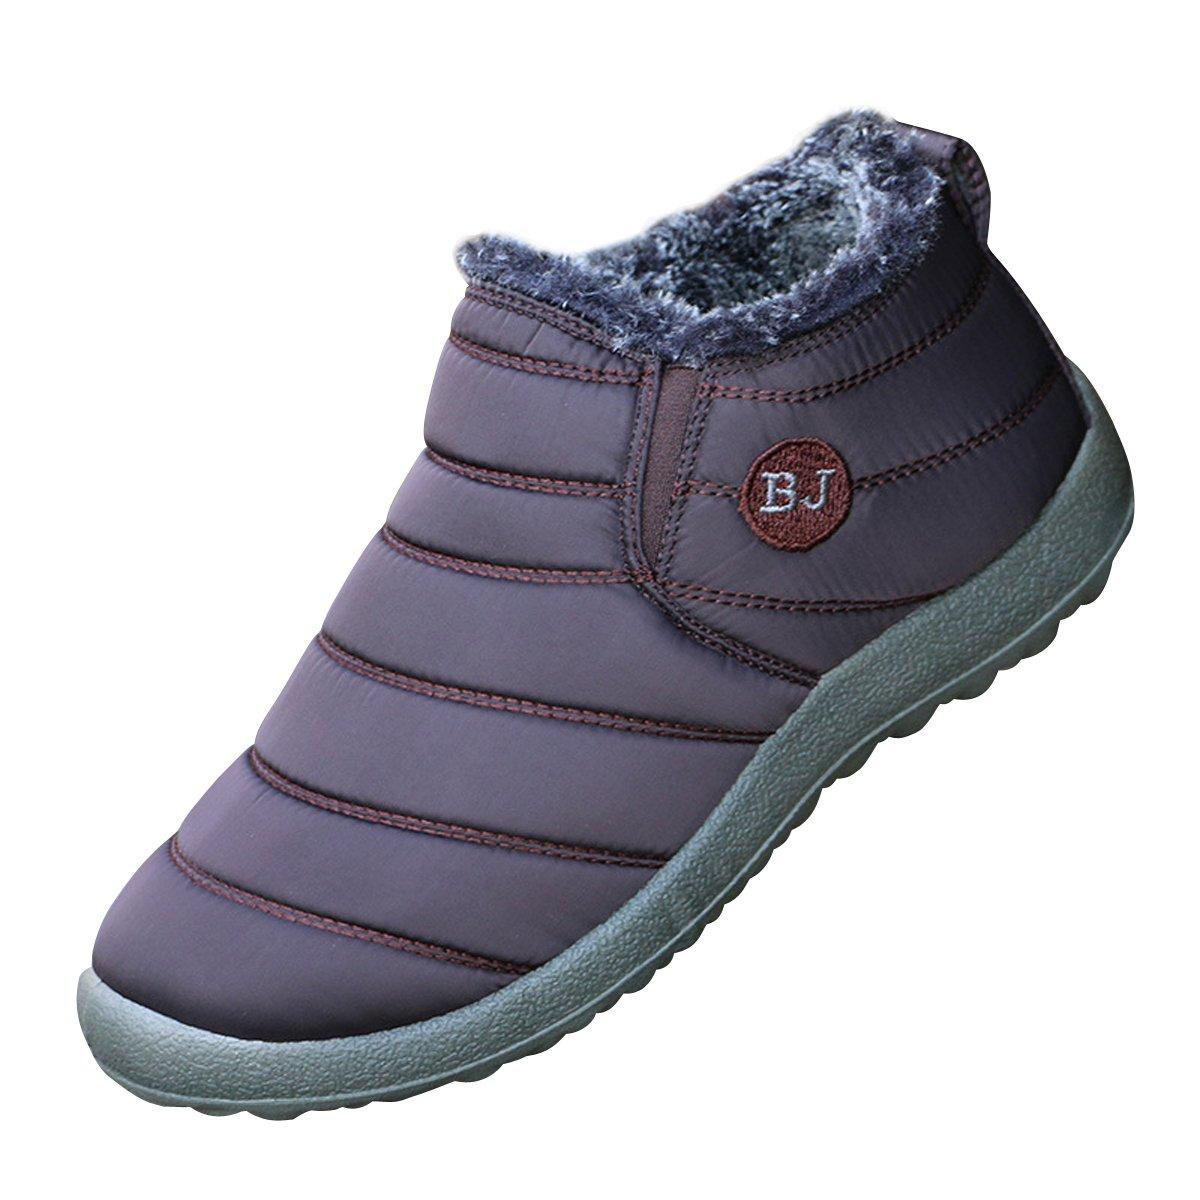 Dear Time Women Winter Snow Ankle Boots Fur Lining Waterproof Outdoor Slip On Booties Sneakers US 9